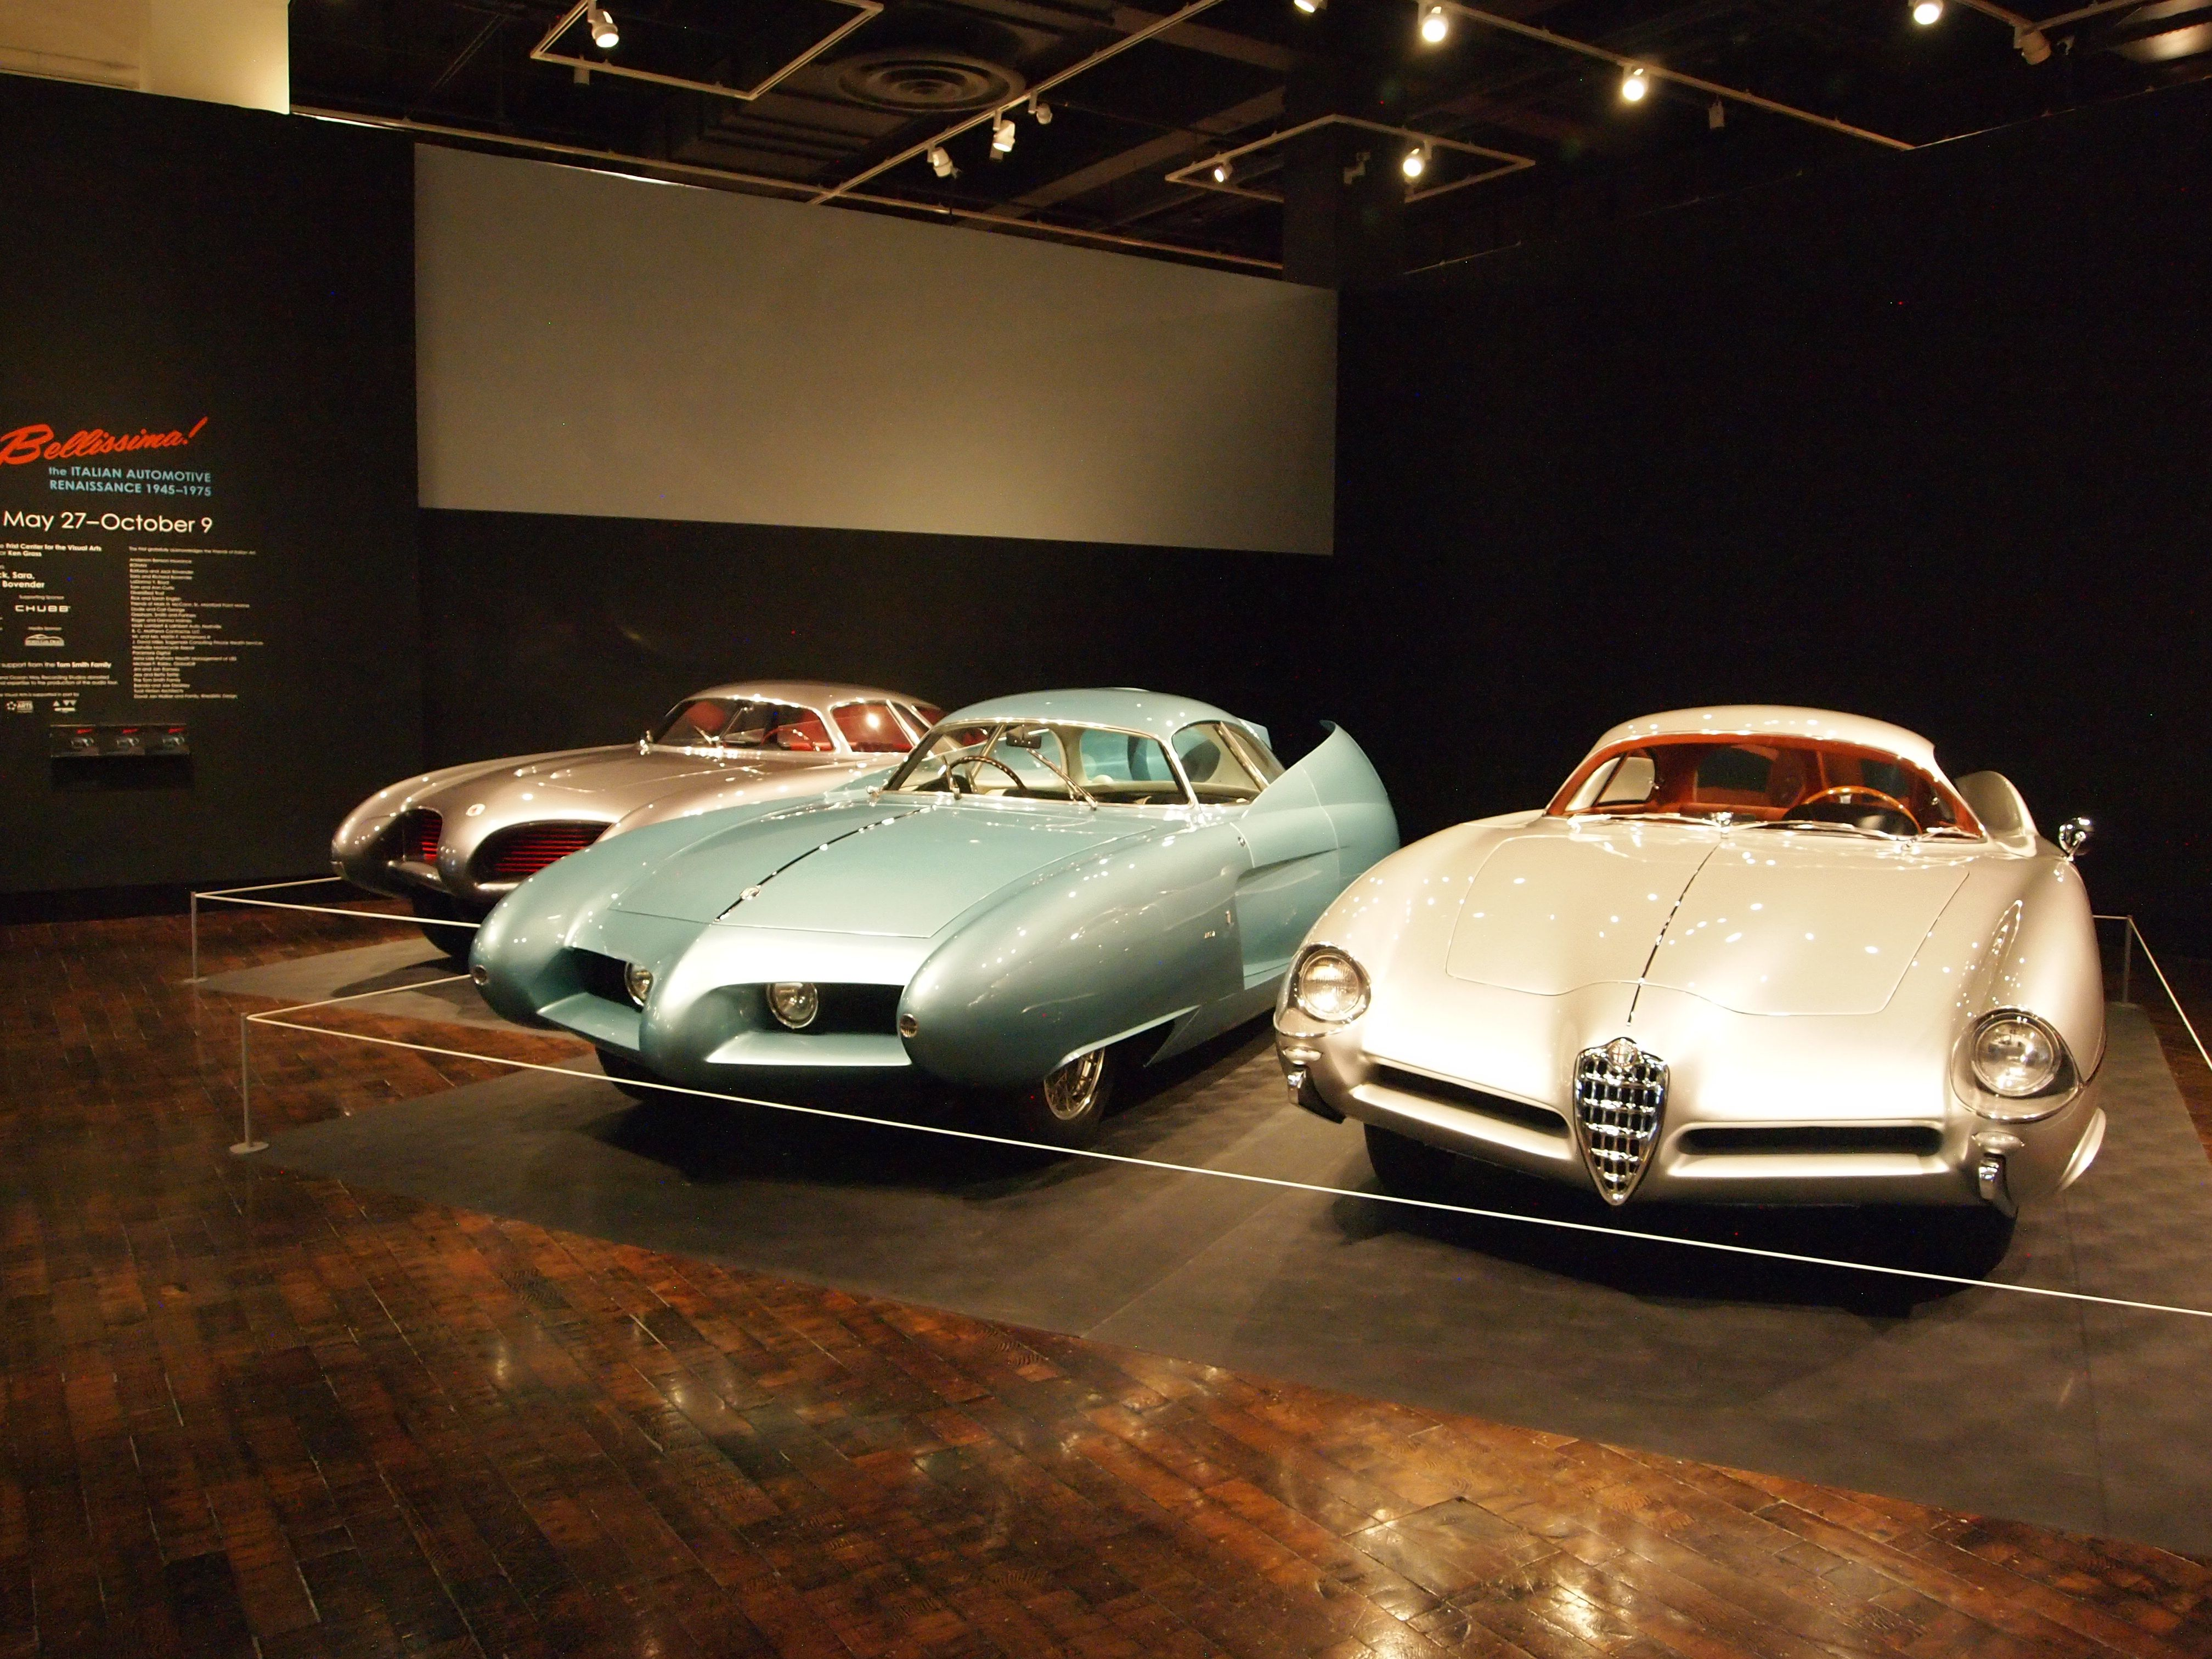 alfa romeo bat 5-7-9 concept cars are on display at an italian car